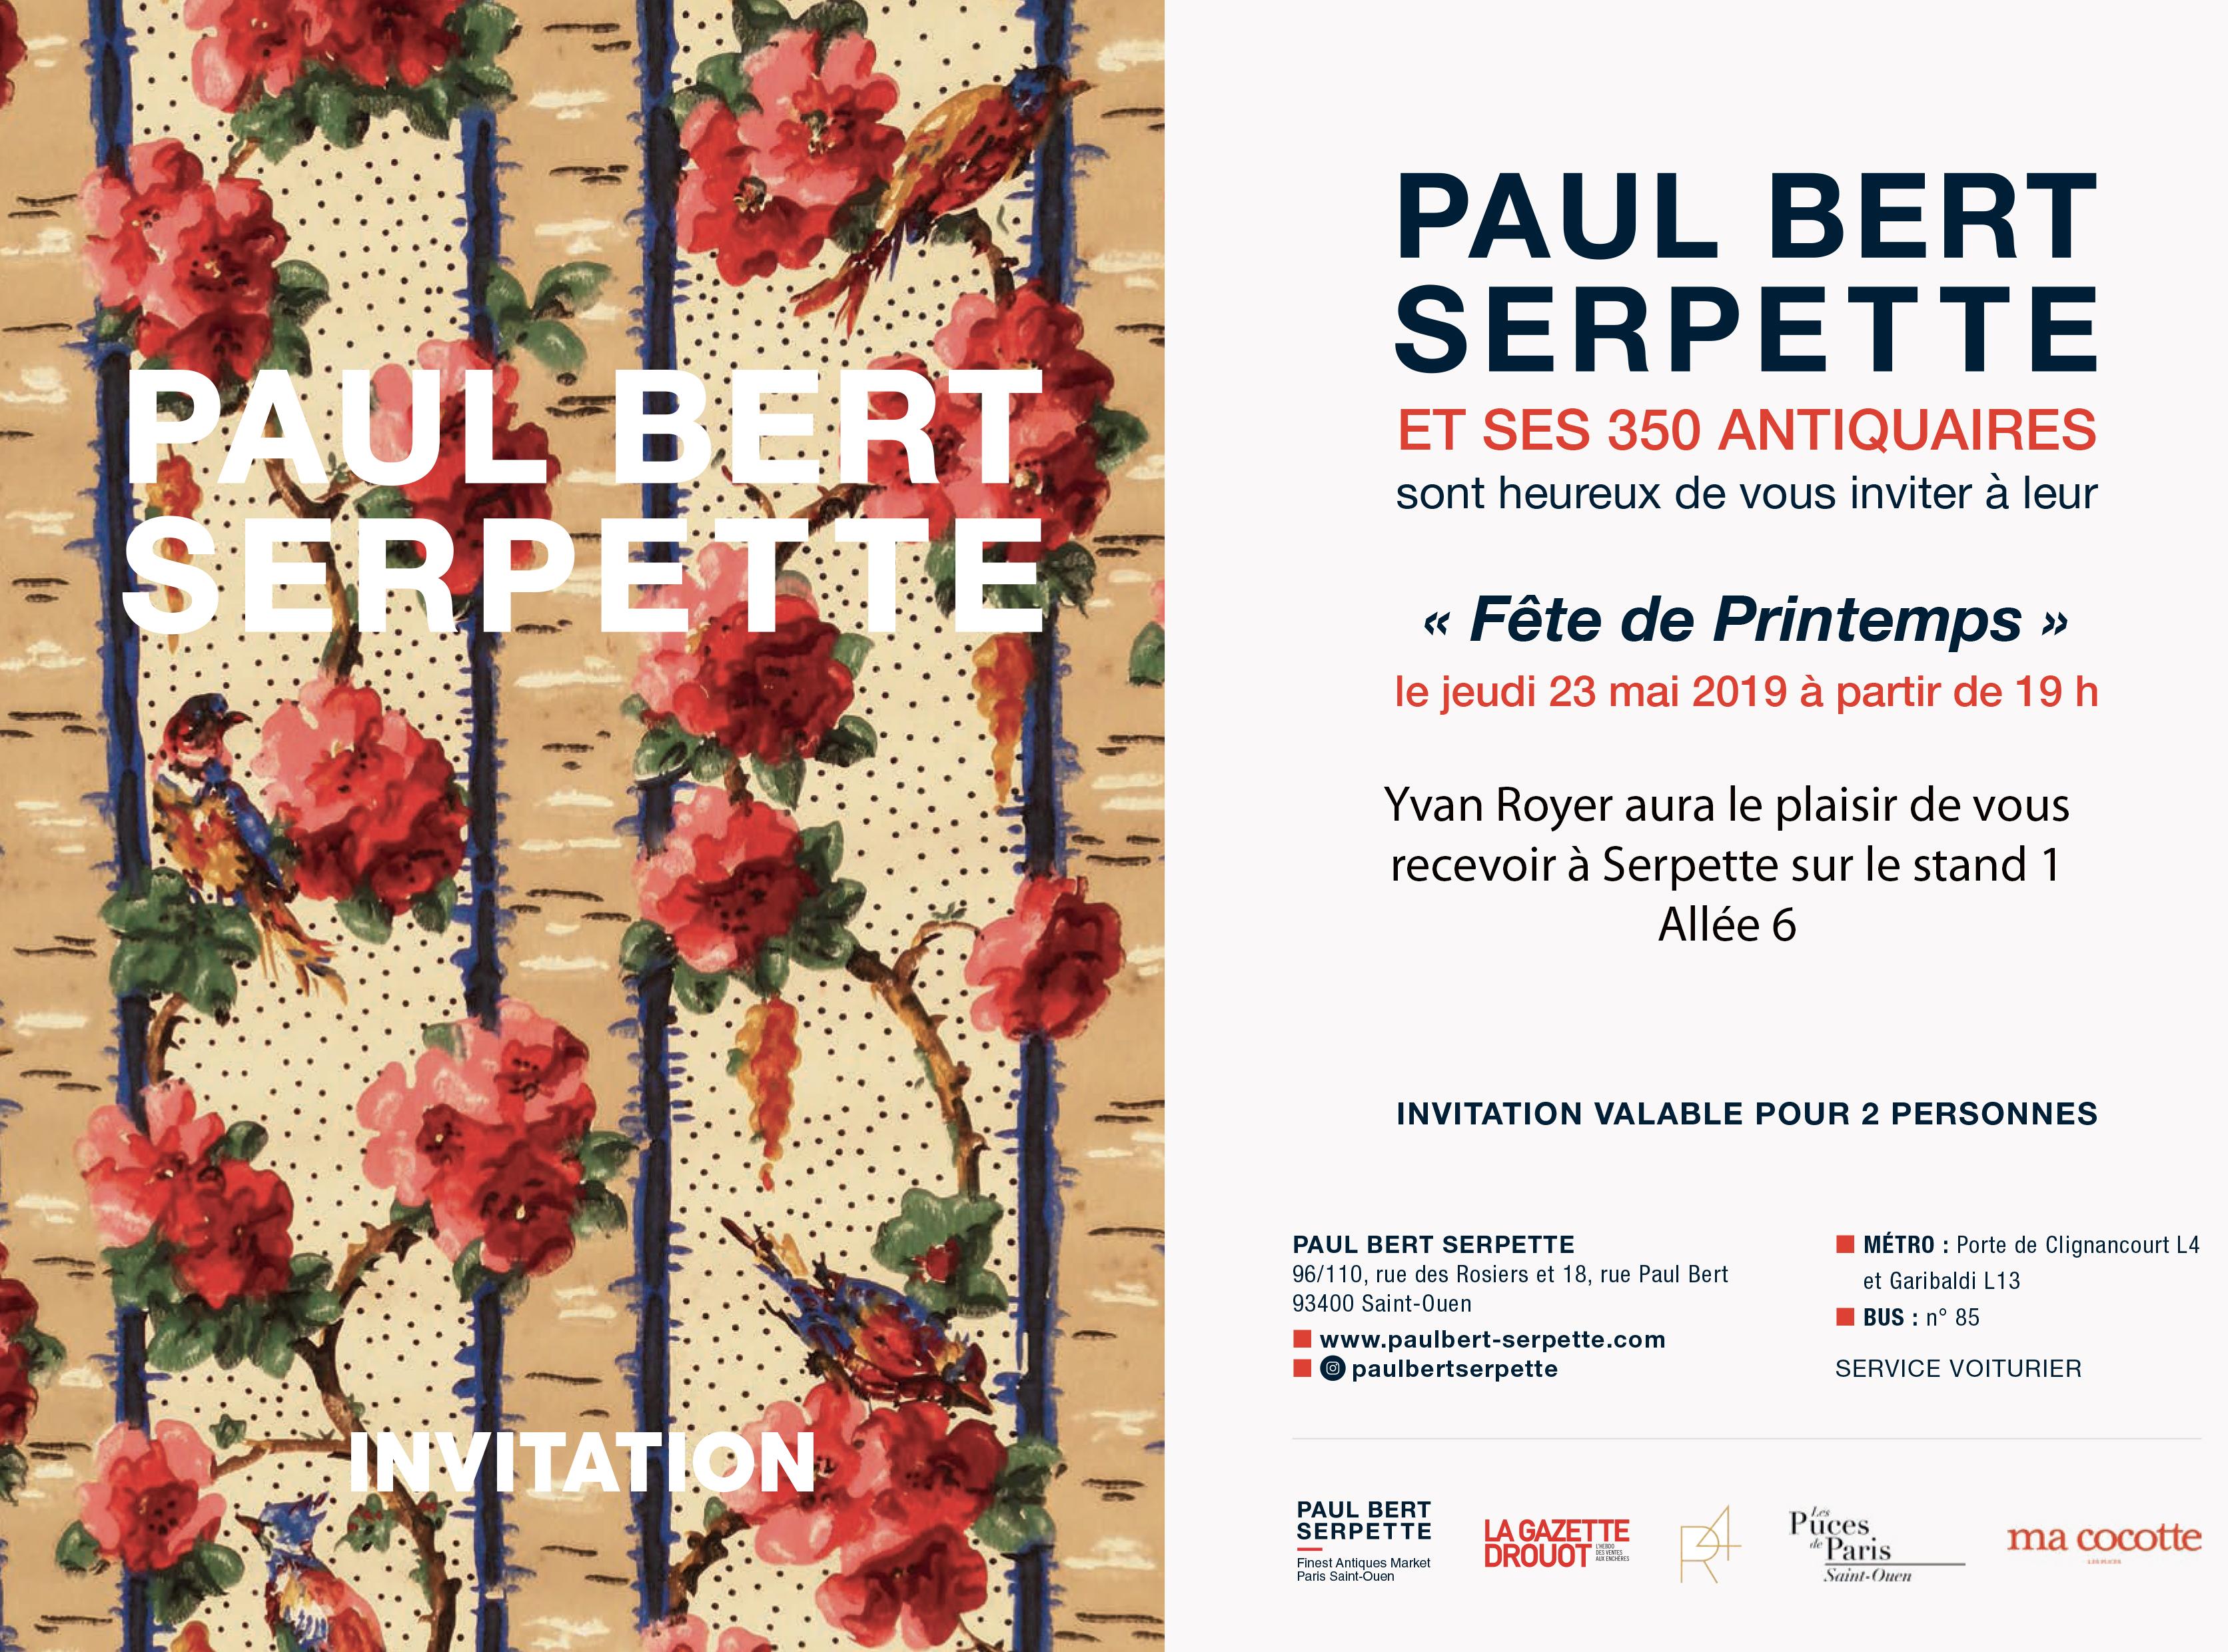 Paul Bert Serpette Invitation 23 mai 2019 - Fete du Printemps WEB